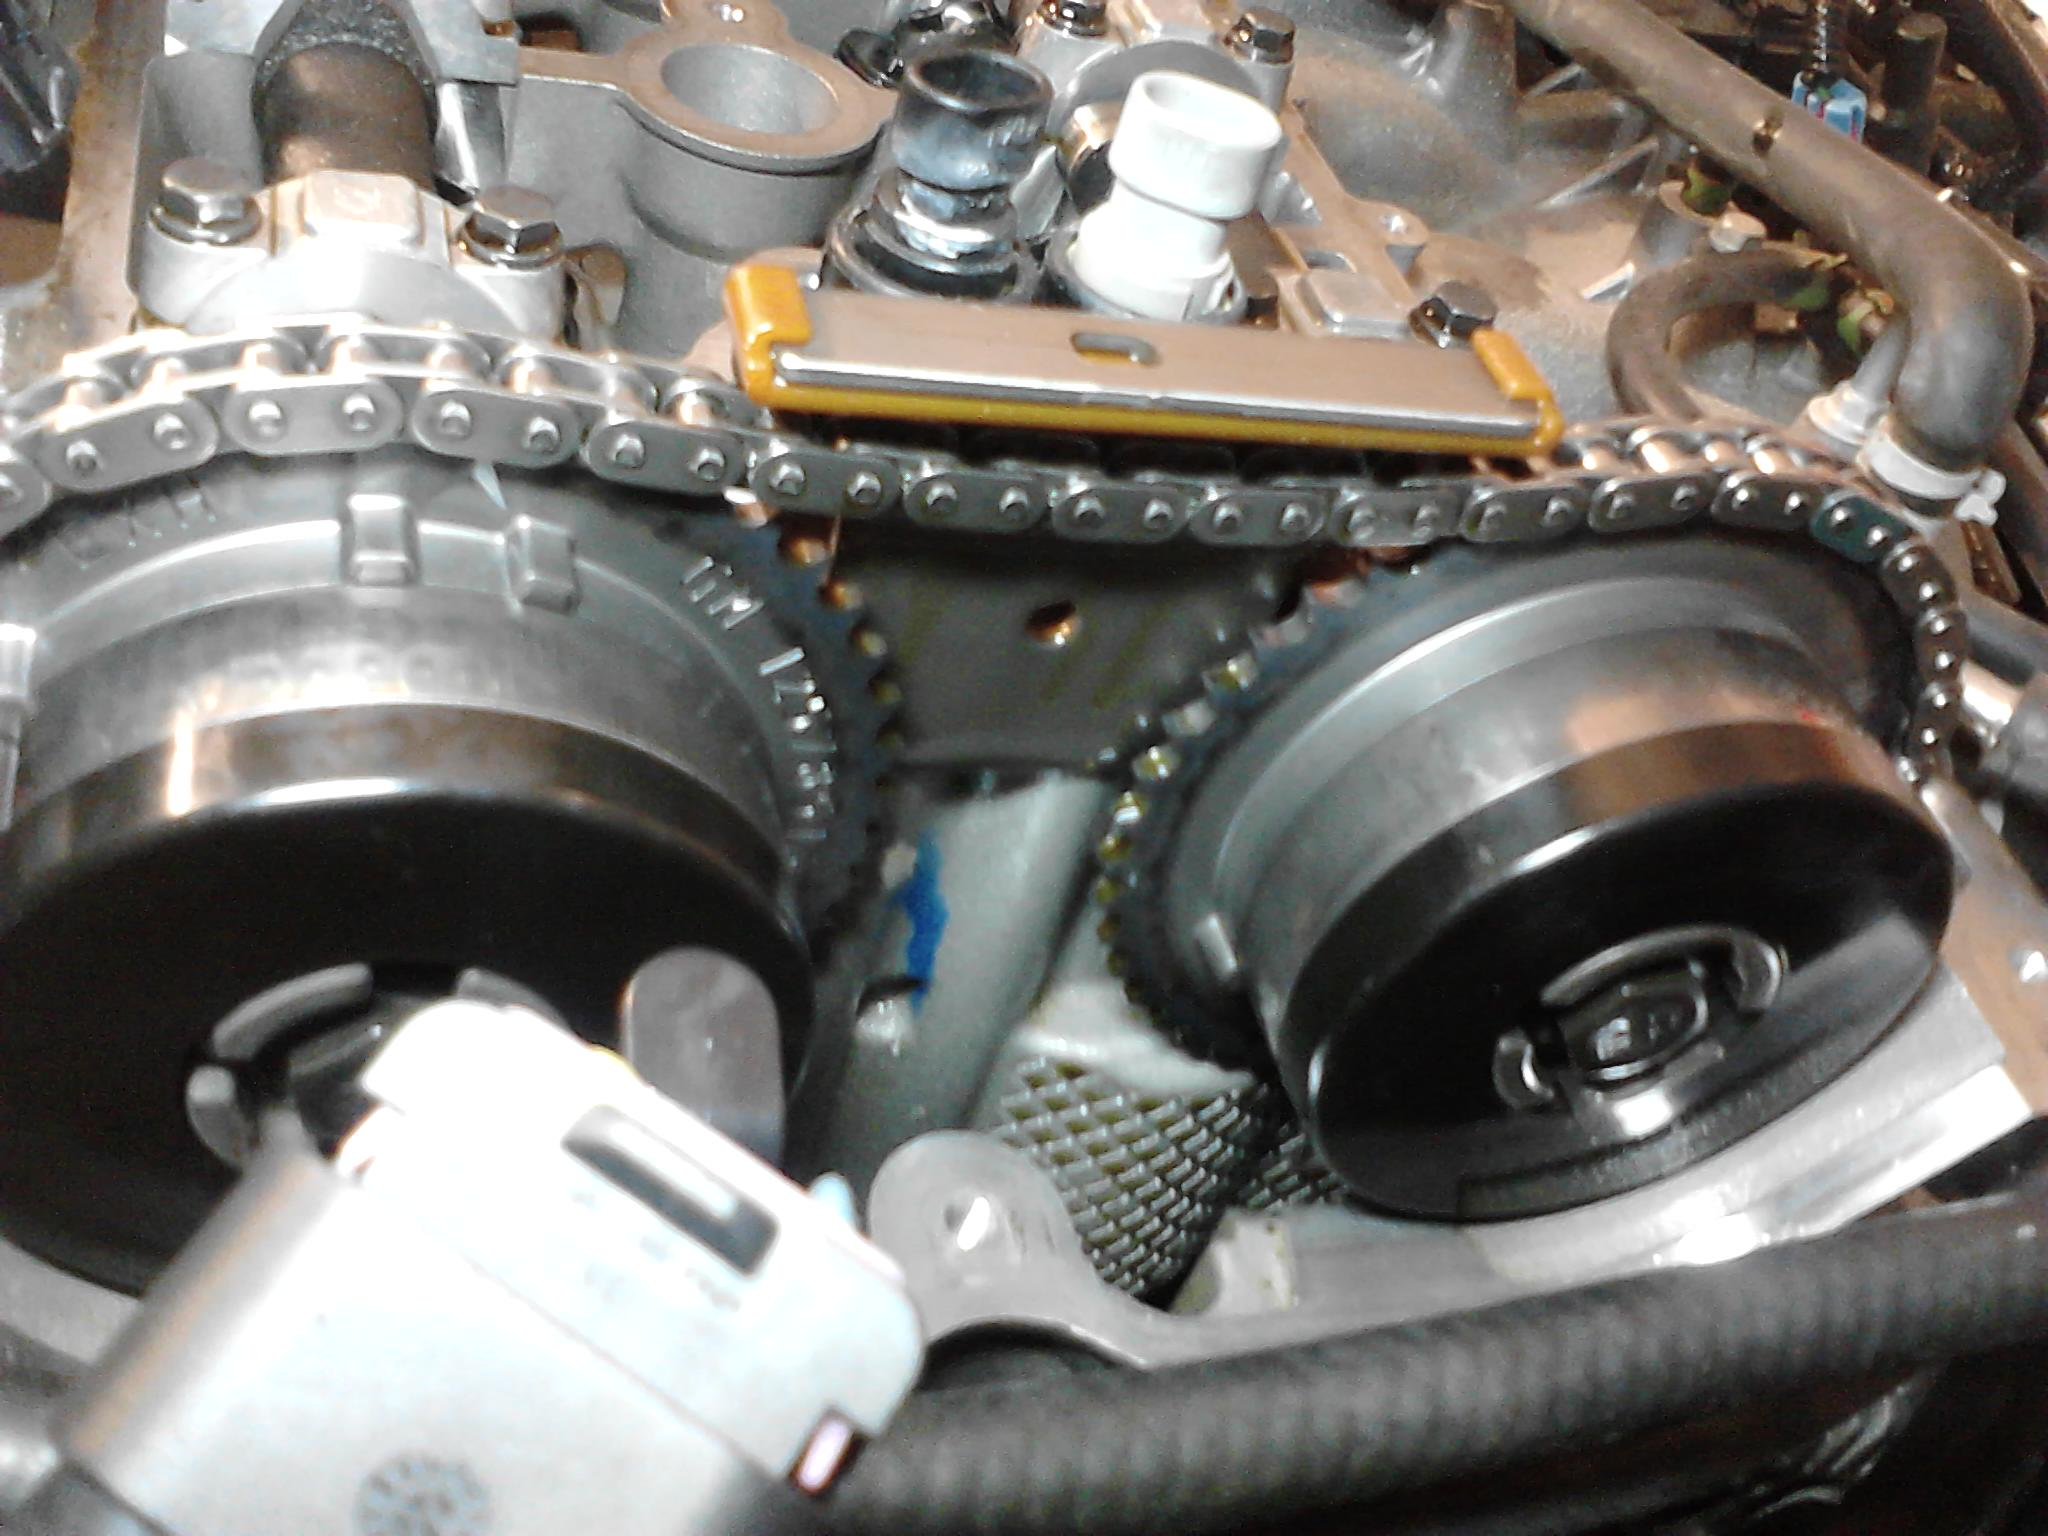 Mazda Rx8 O2 Sensor Location additionally Dodge O2 Sensors Location 2003 in addition Heated Oxygen Sensor Fuse Location as well 2003 Mazda 6 Fuse Box Relay additionally 2005 Ford Escape V6 Engine Diagram. on 2005 mazda tribute wiring diagram